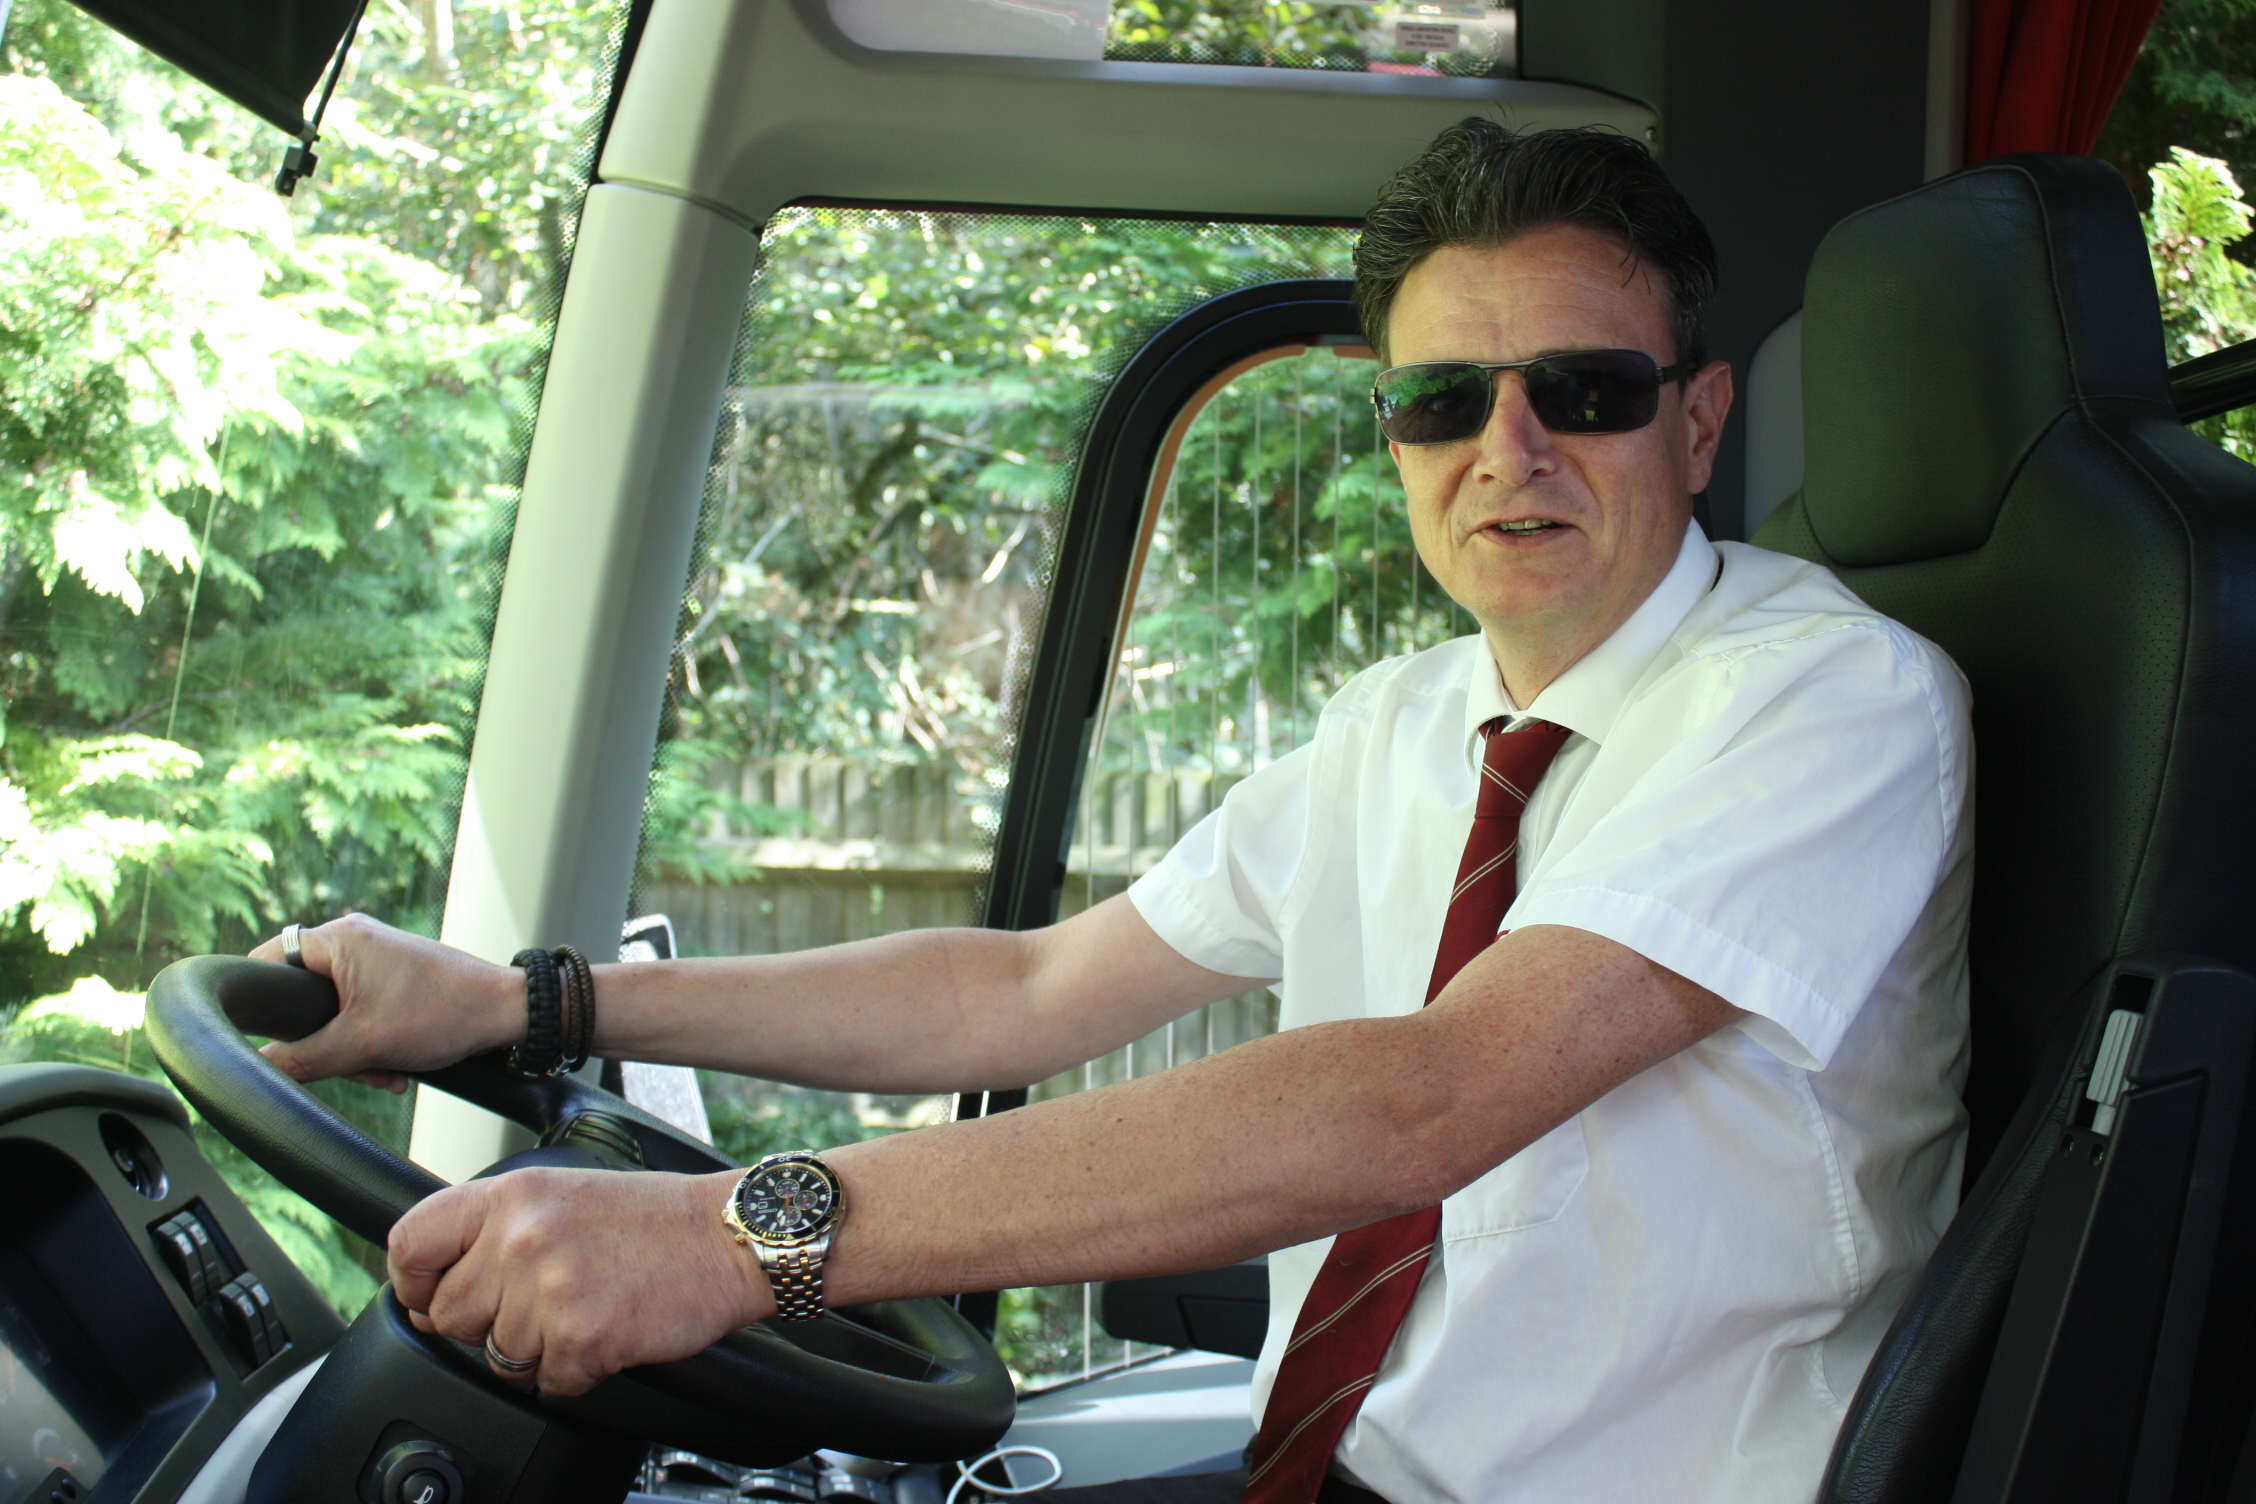 Male Coach Driver